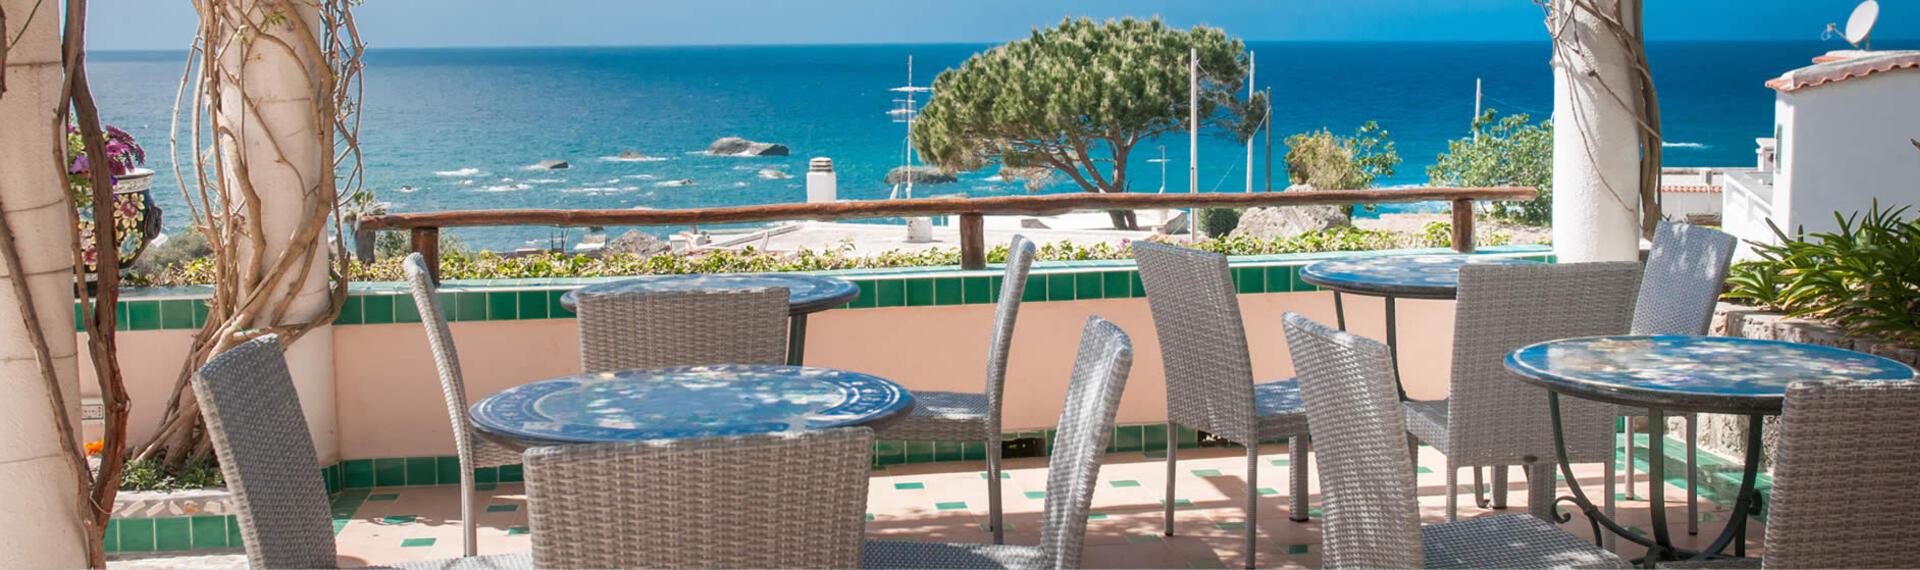 hotelvillabianca en location 009